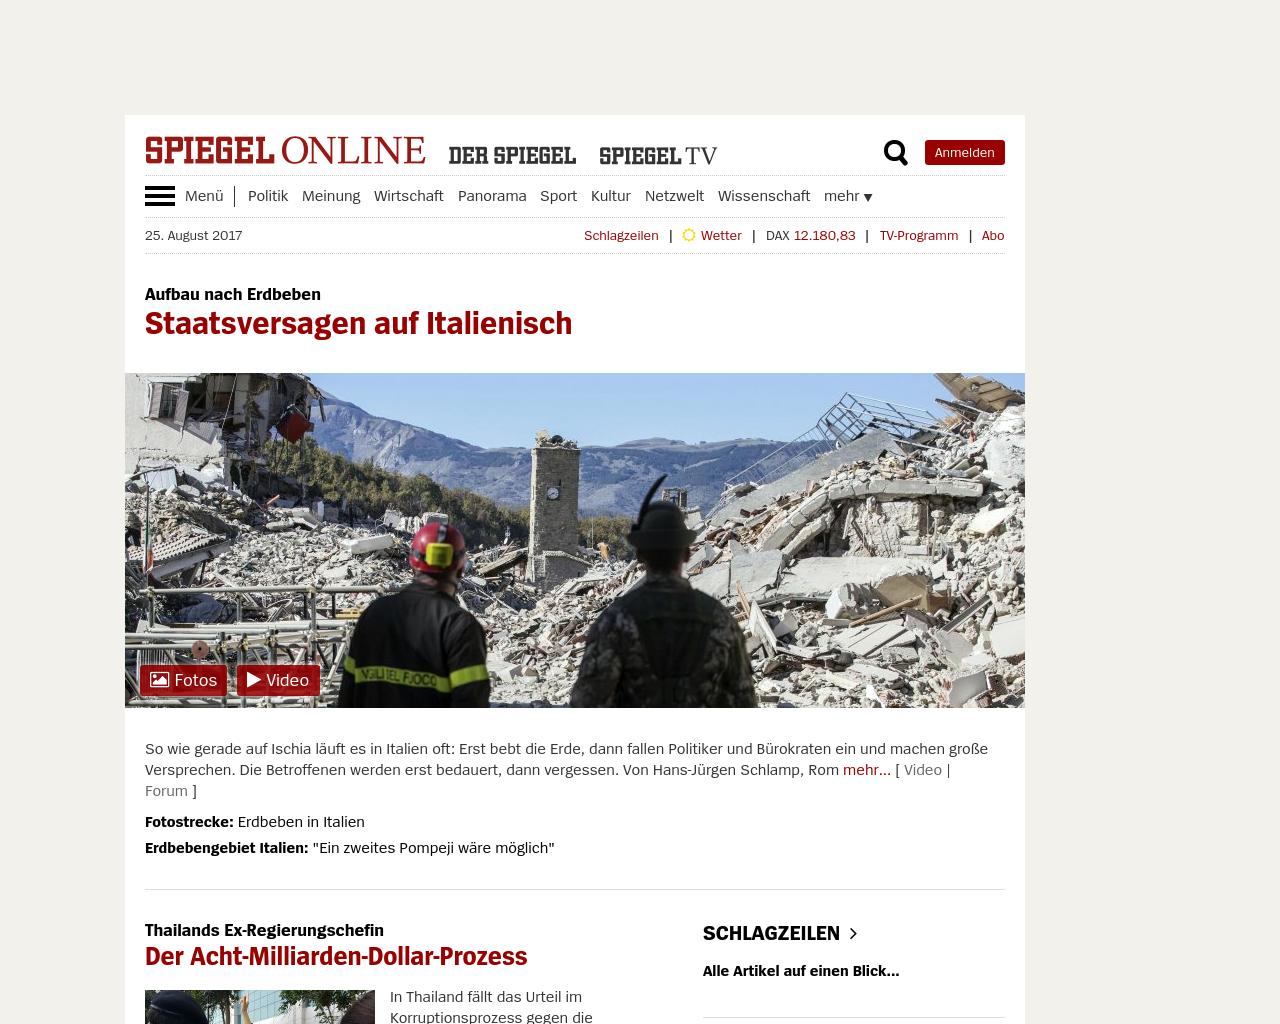 Spiegel-Online-Advertising-Reviews-Pricing